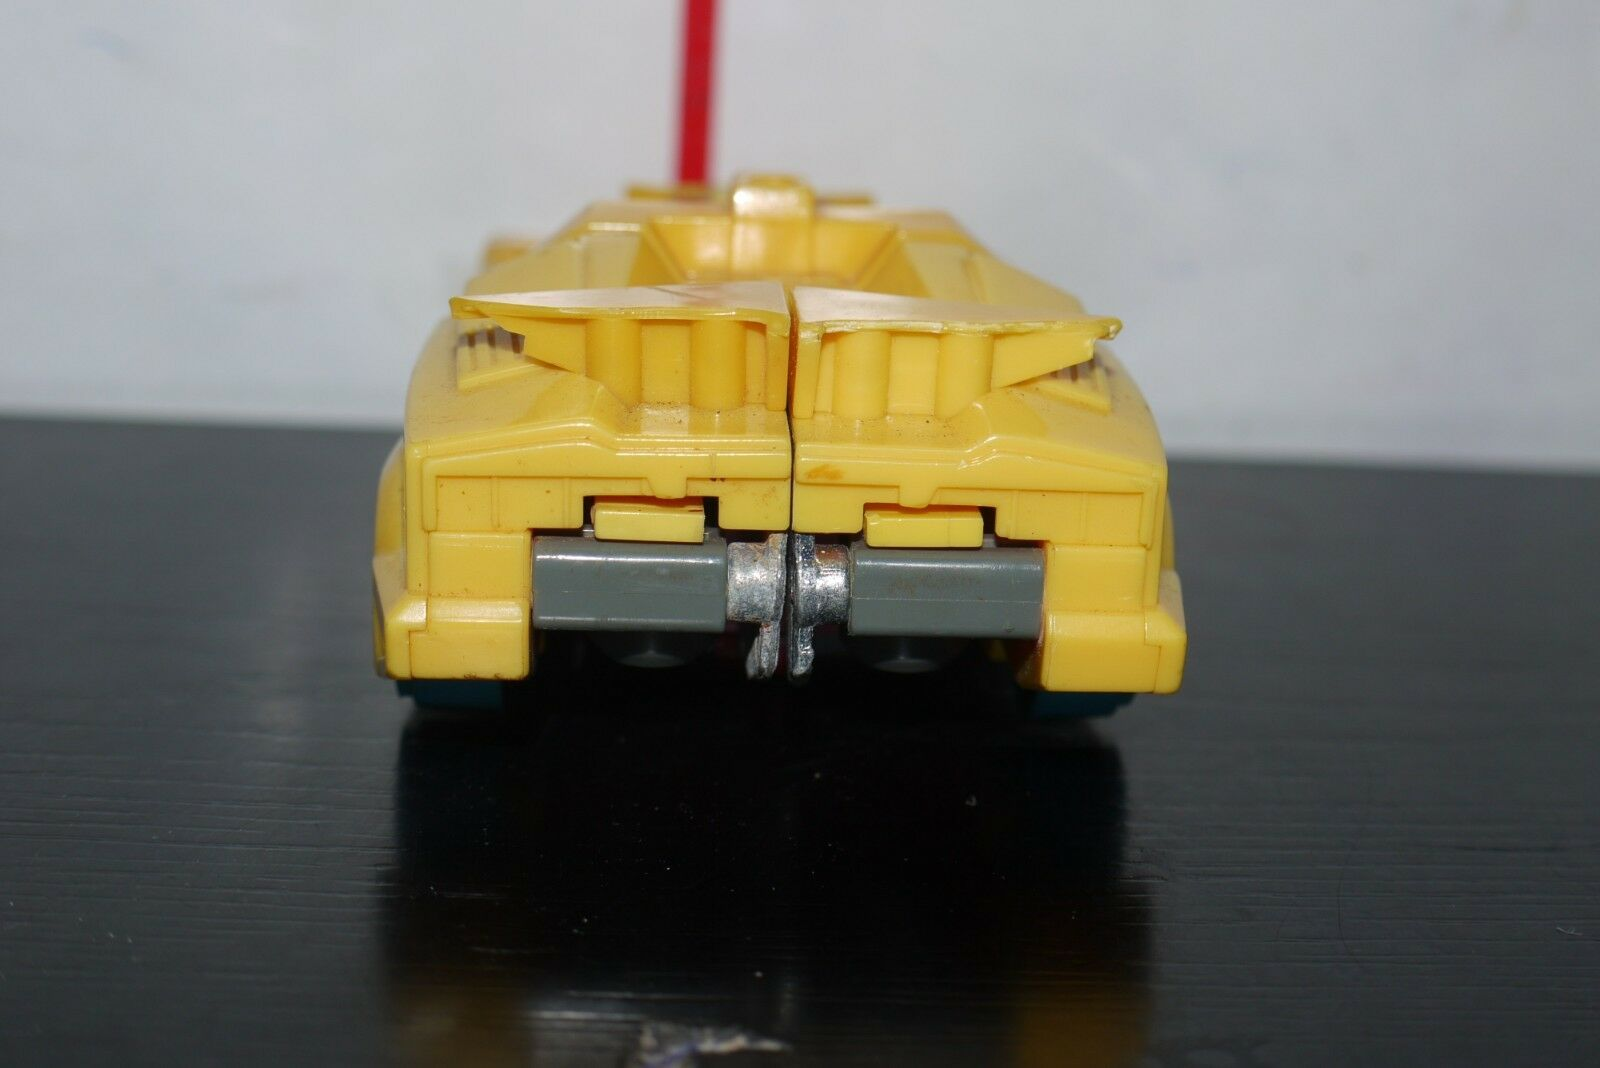 TRANSFORMERS G1 Motorvator Flame Hasbro 1989 European FIGURE FIGURE FIGURE BROKEN a71dd0